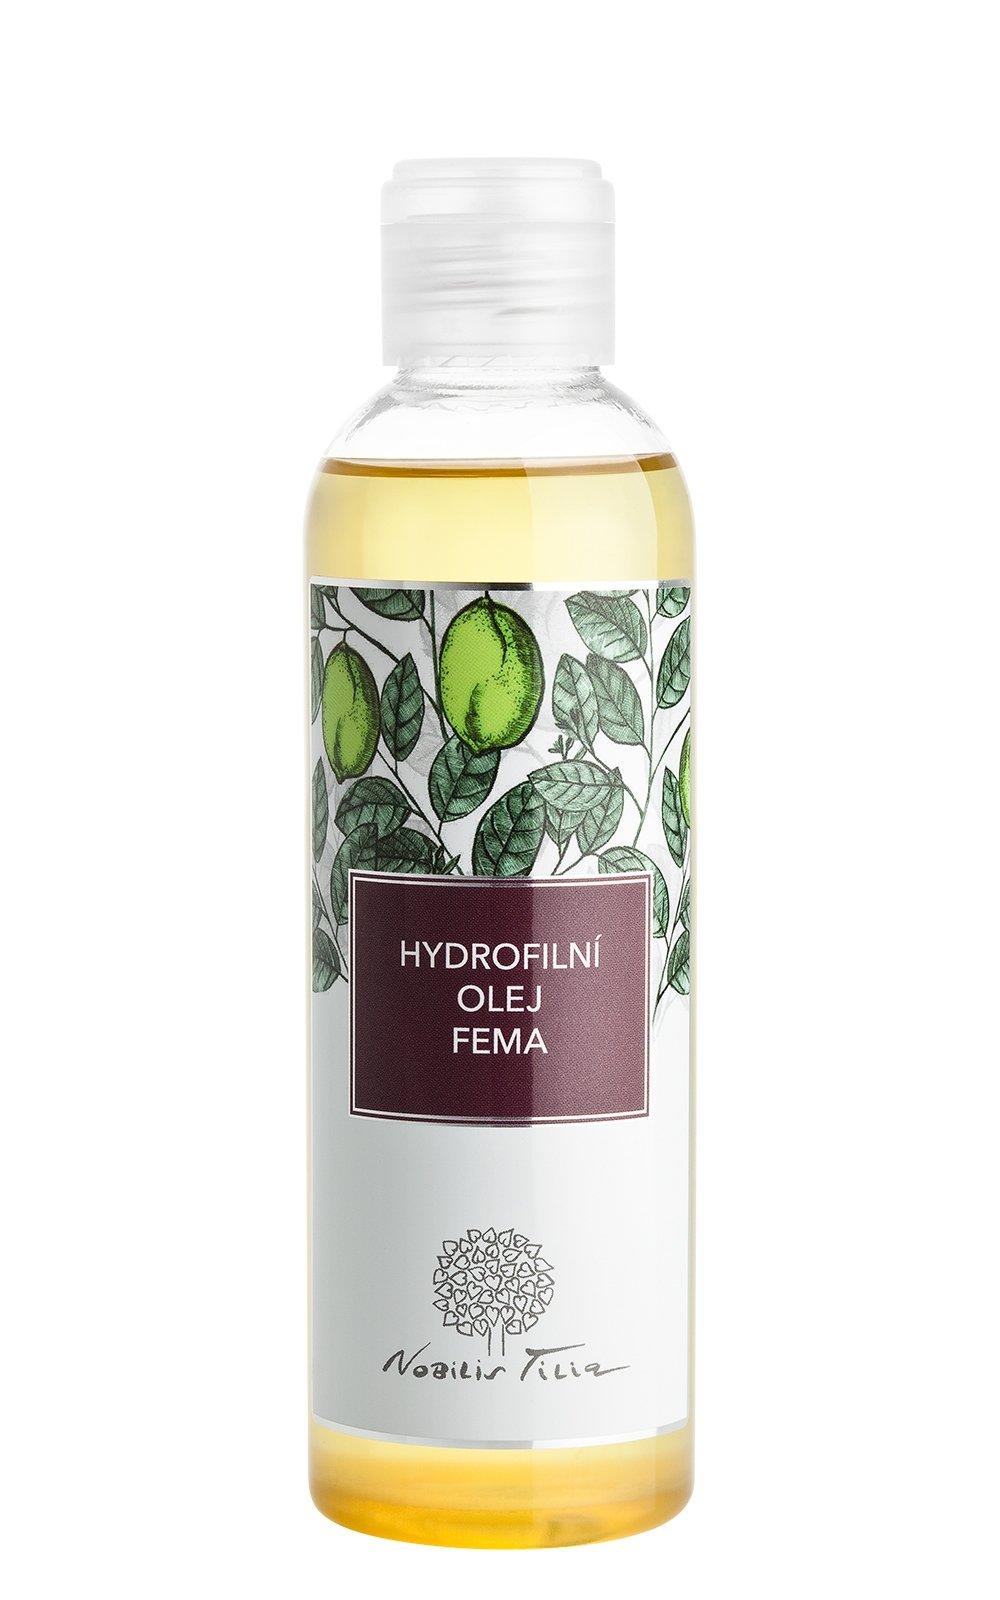 Hydrofilní olej Fema